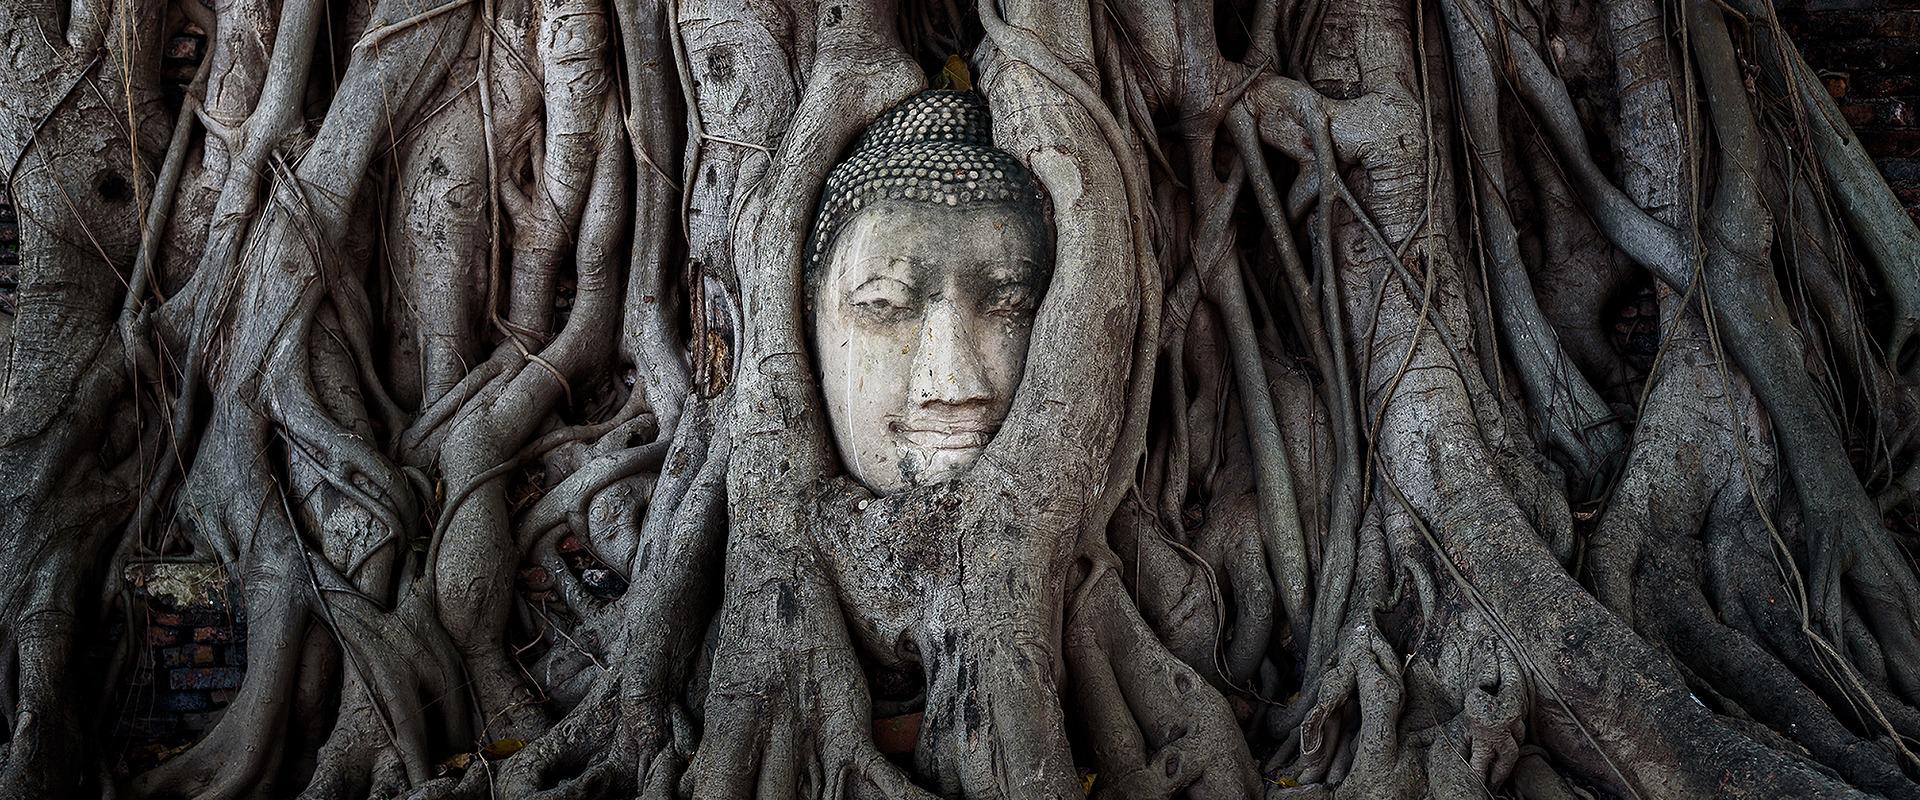 Thaïlande | Ayutthaya